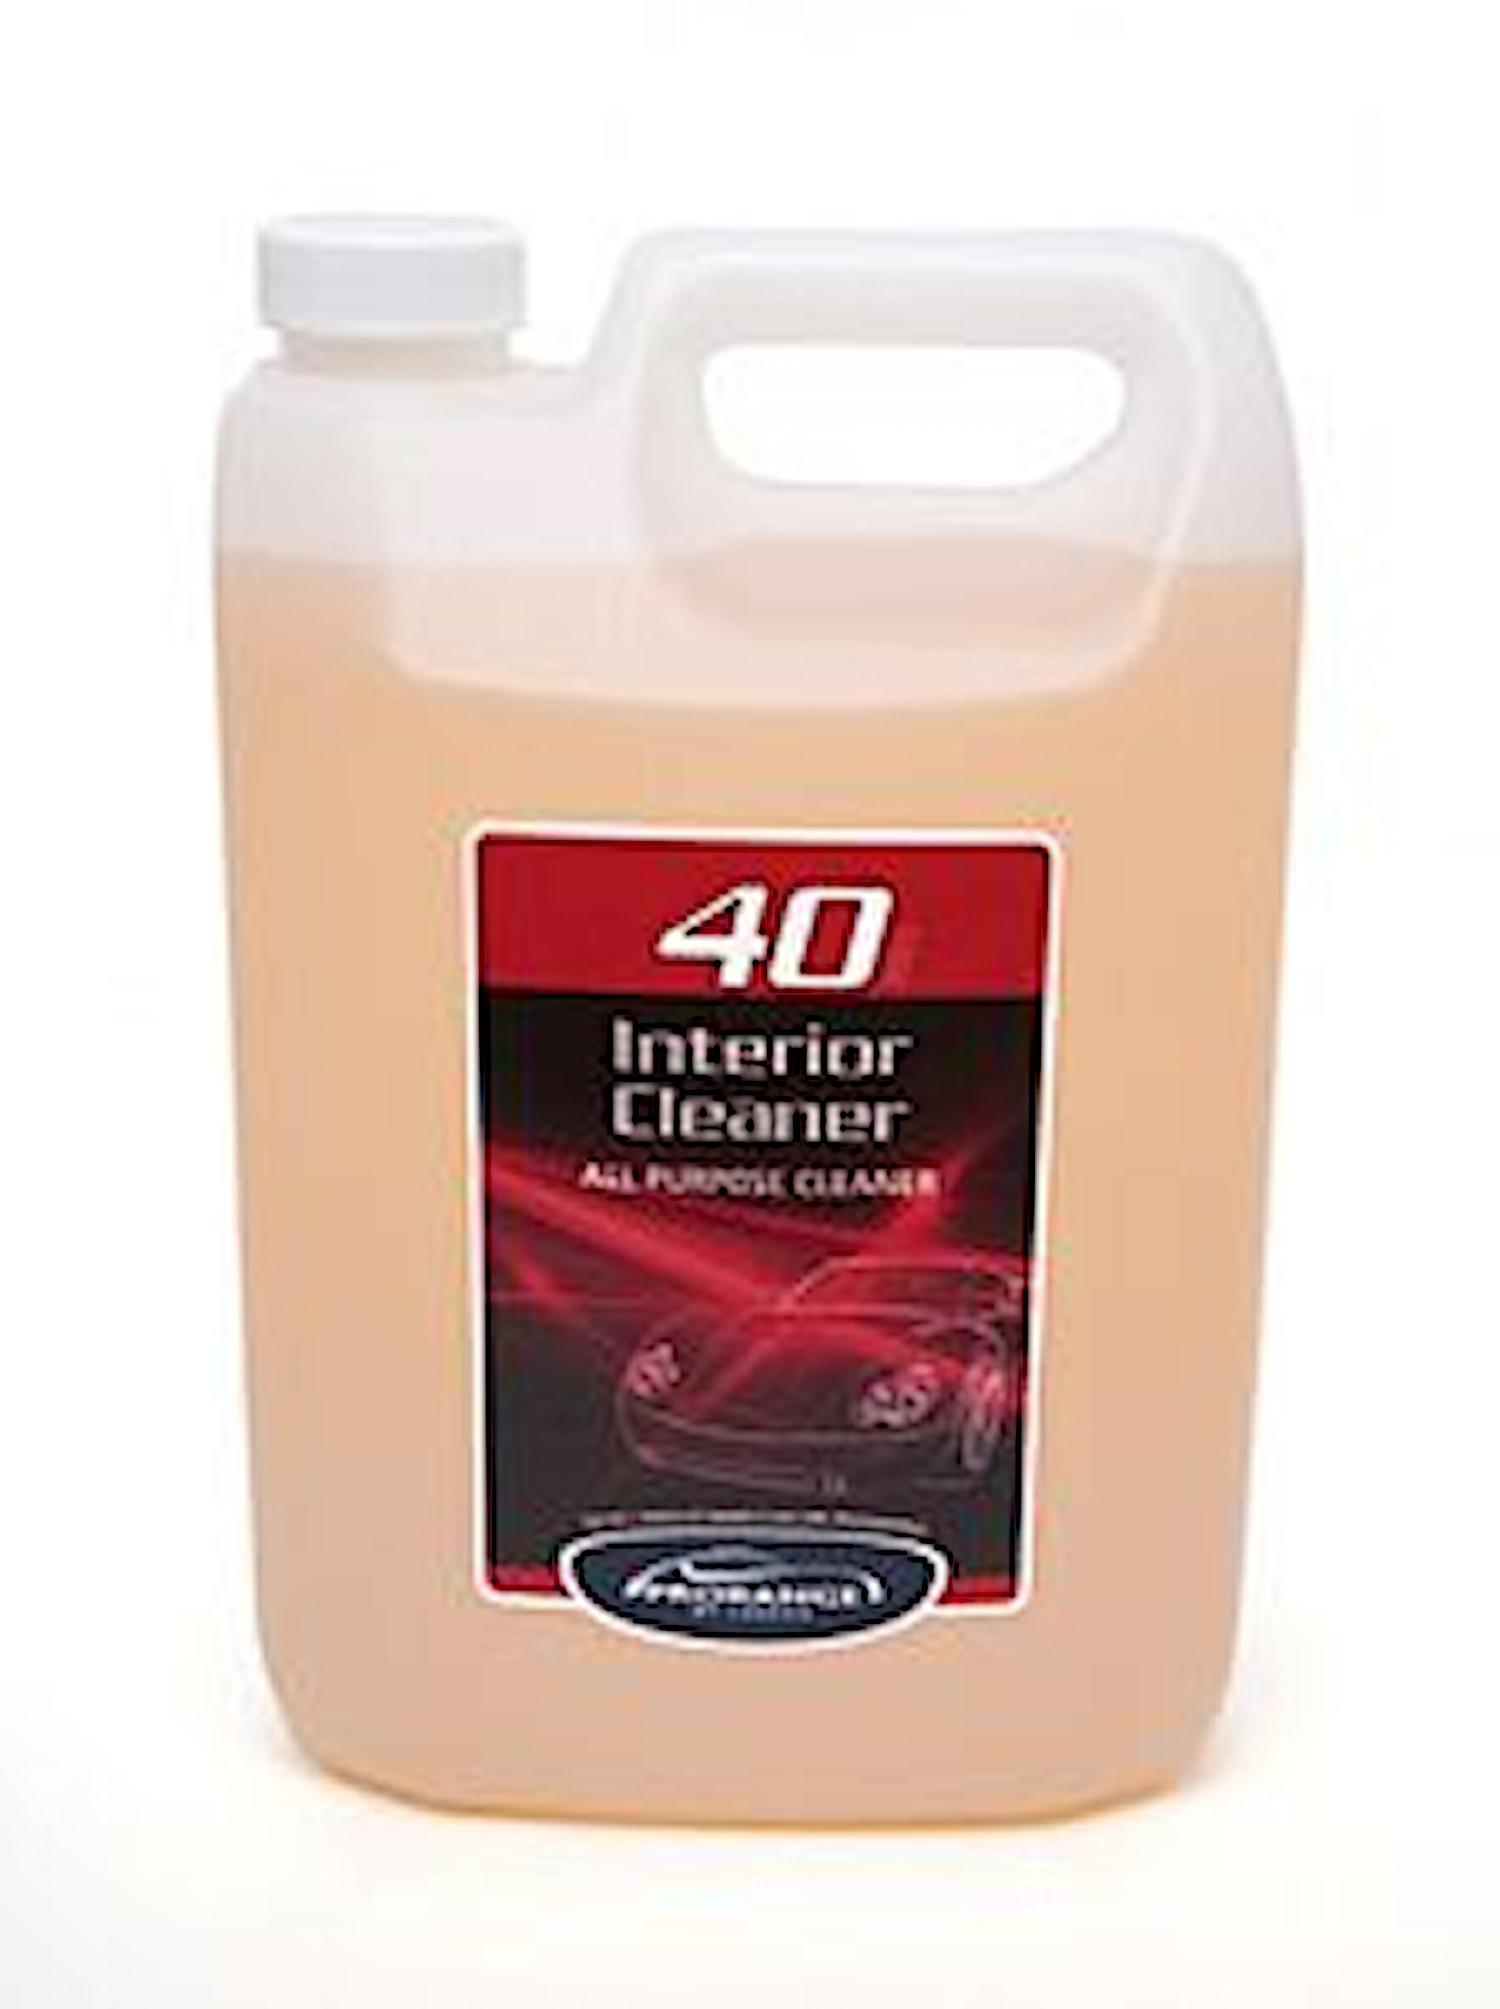 Interior Cleaner 40i 5L